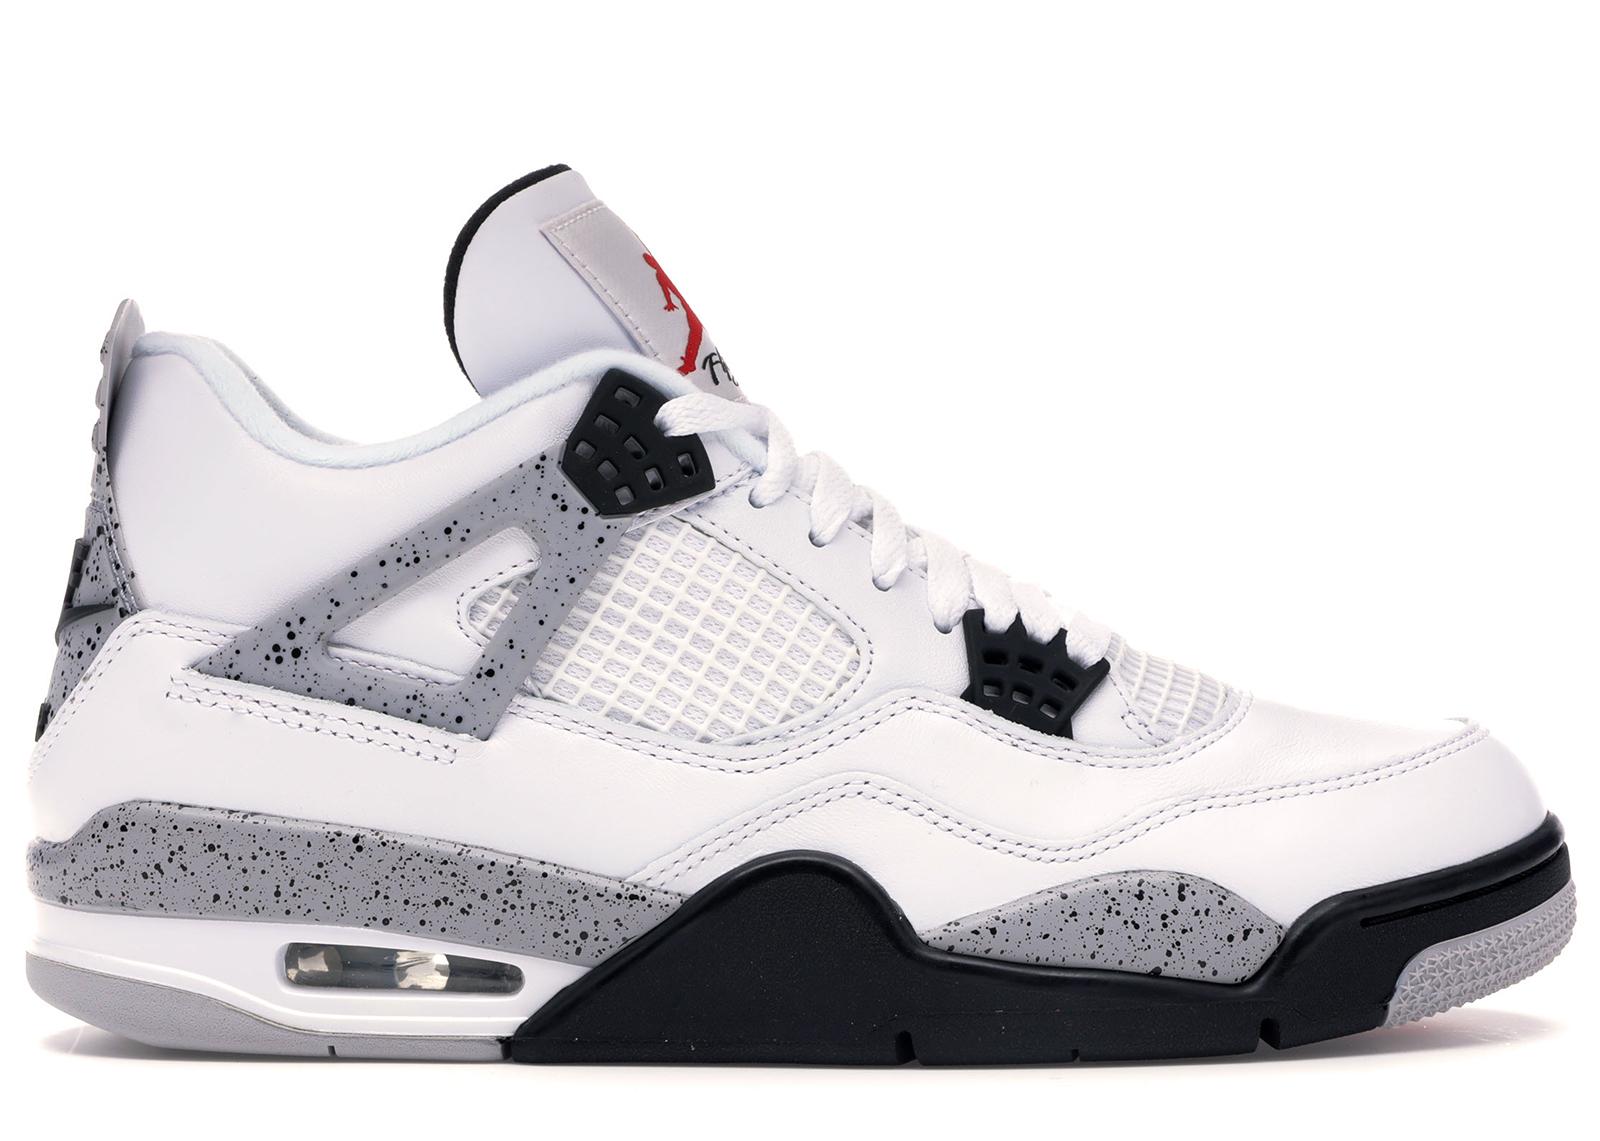 Buy Air Jordan 4 Shoes & Deadstock Sneakers